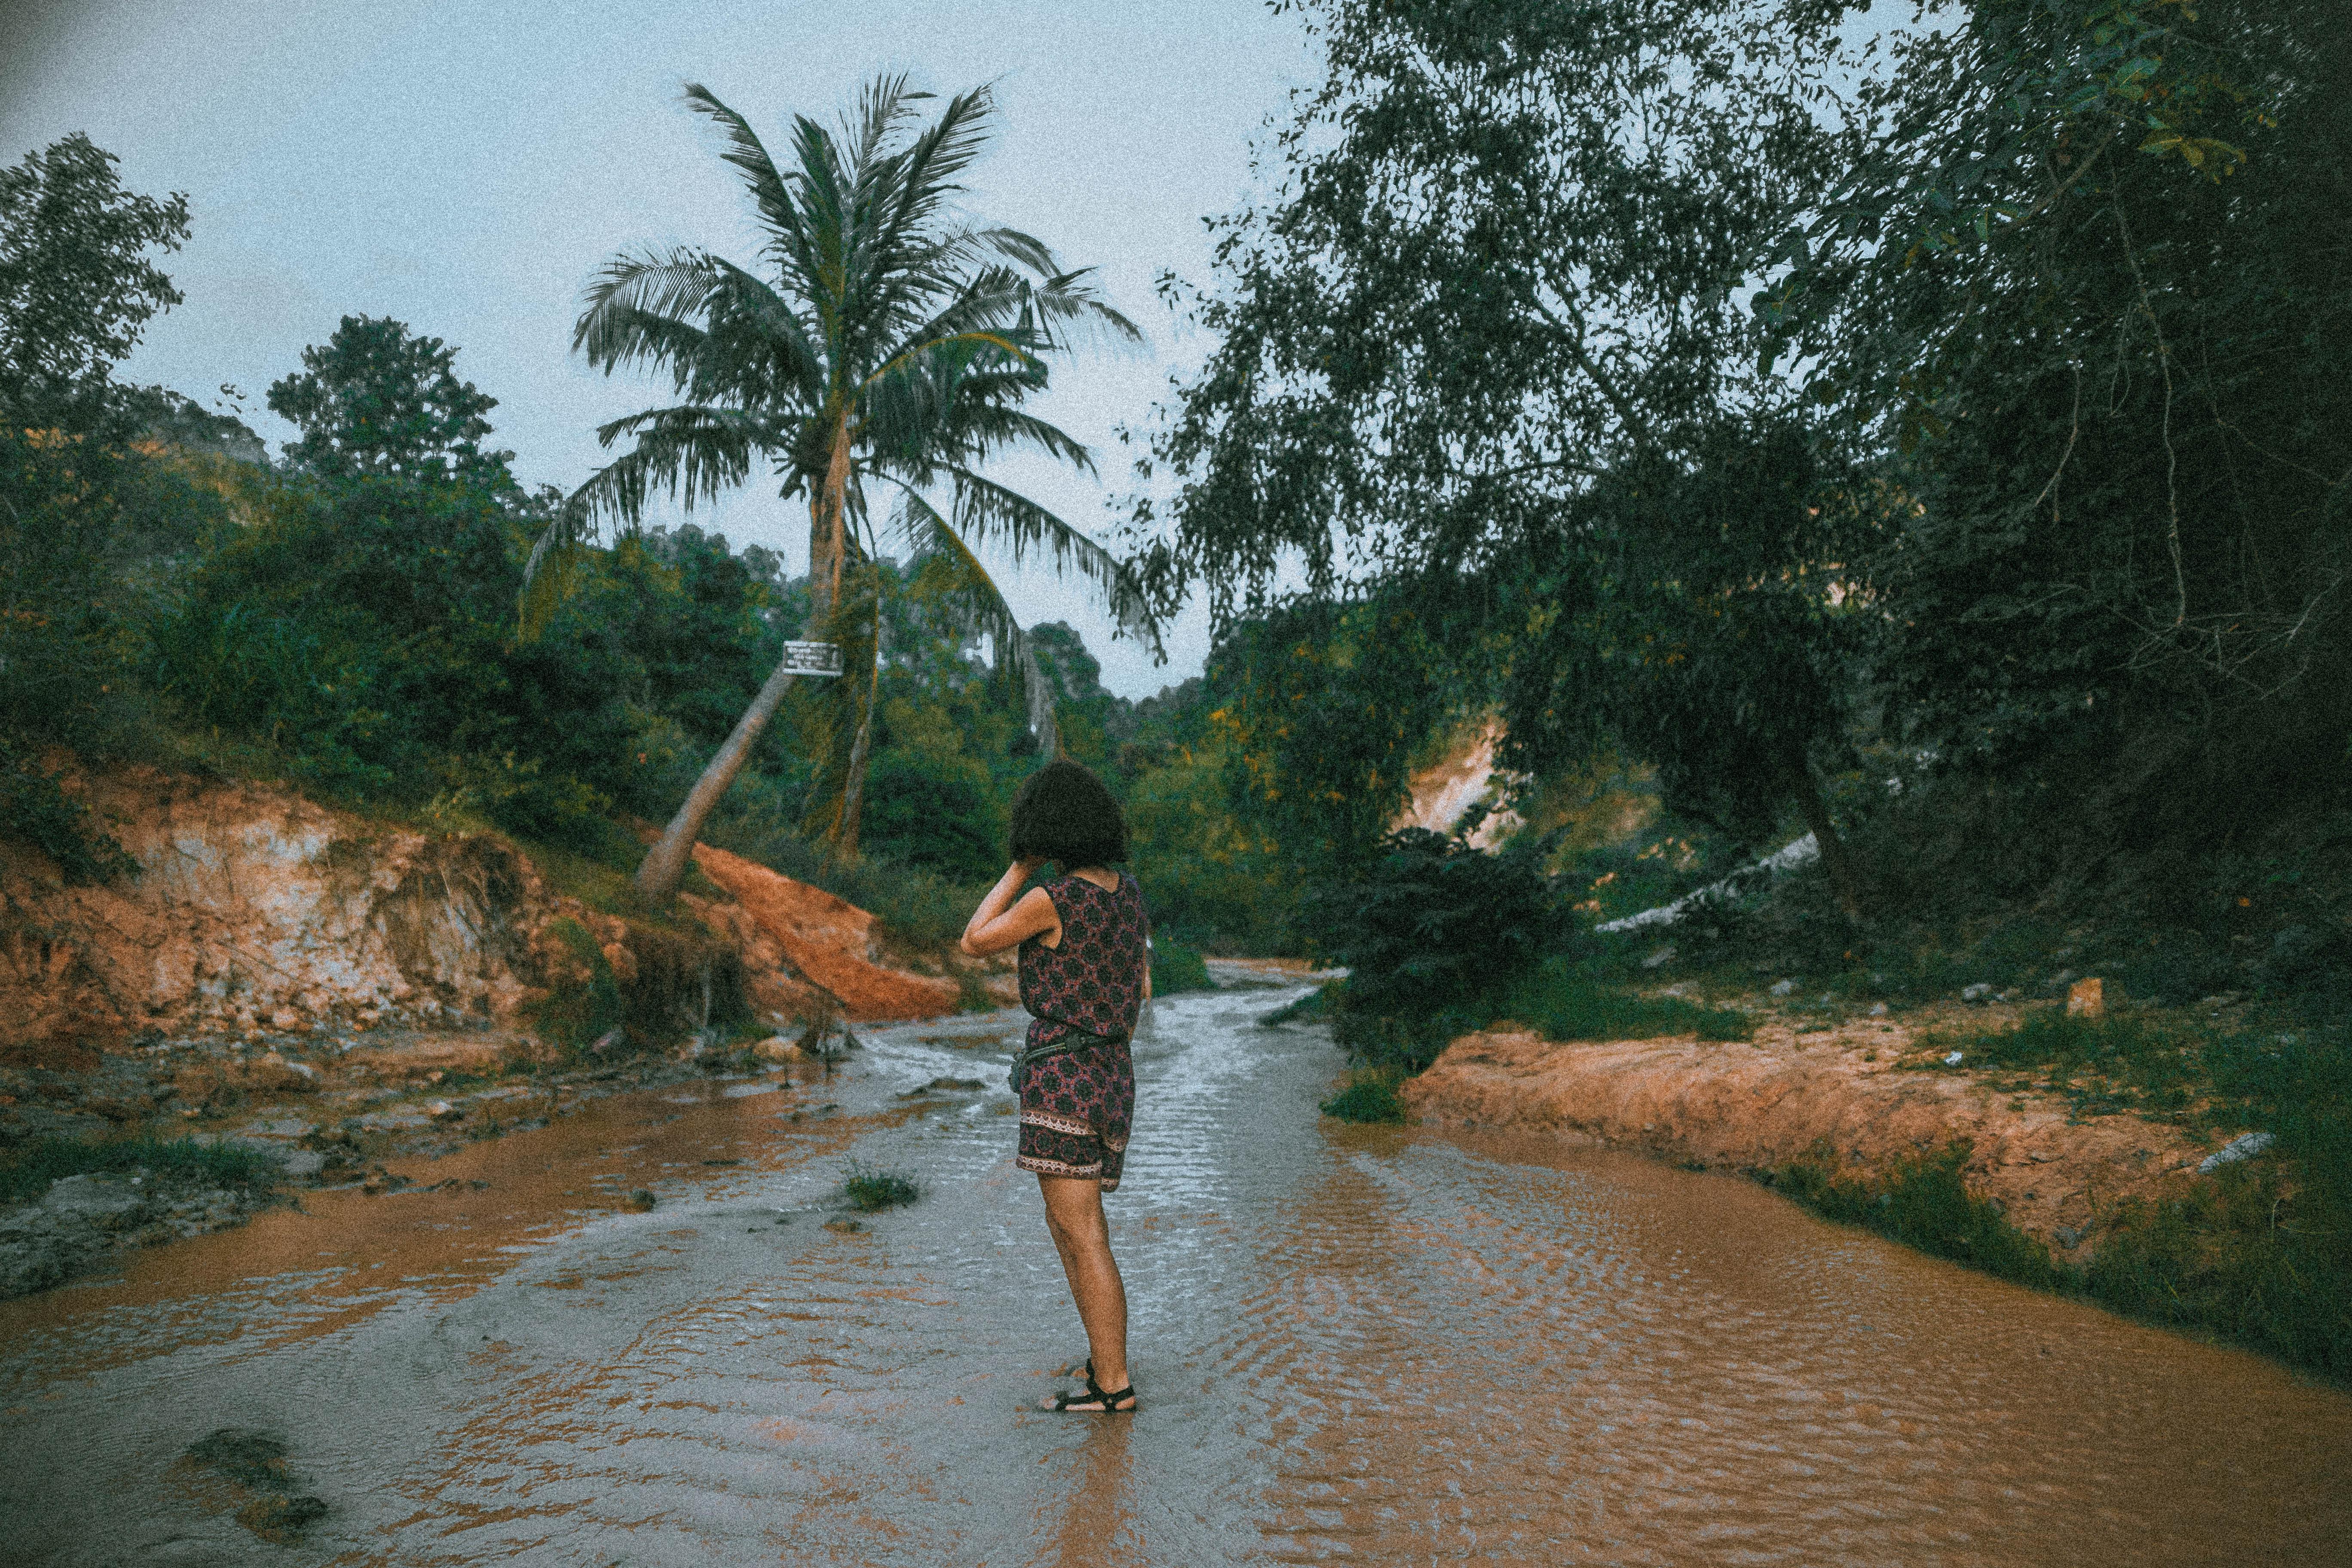 red sand dunes in vietnam pure nature south east asia mui ne fairy stream river palms